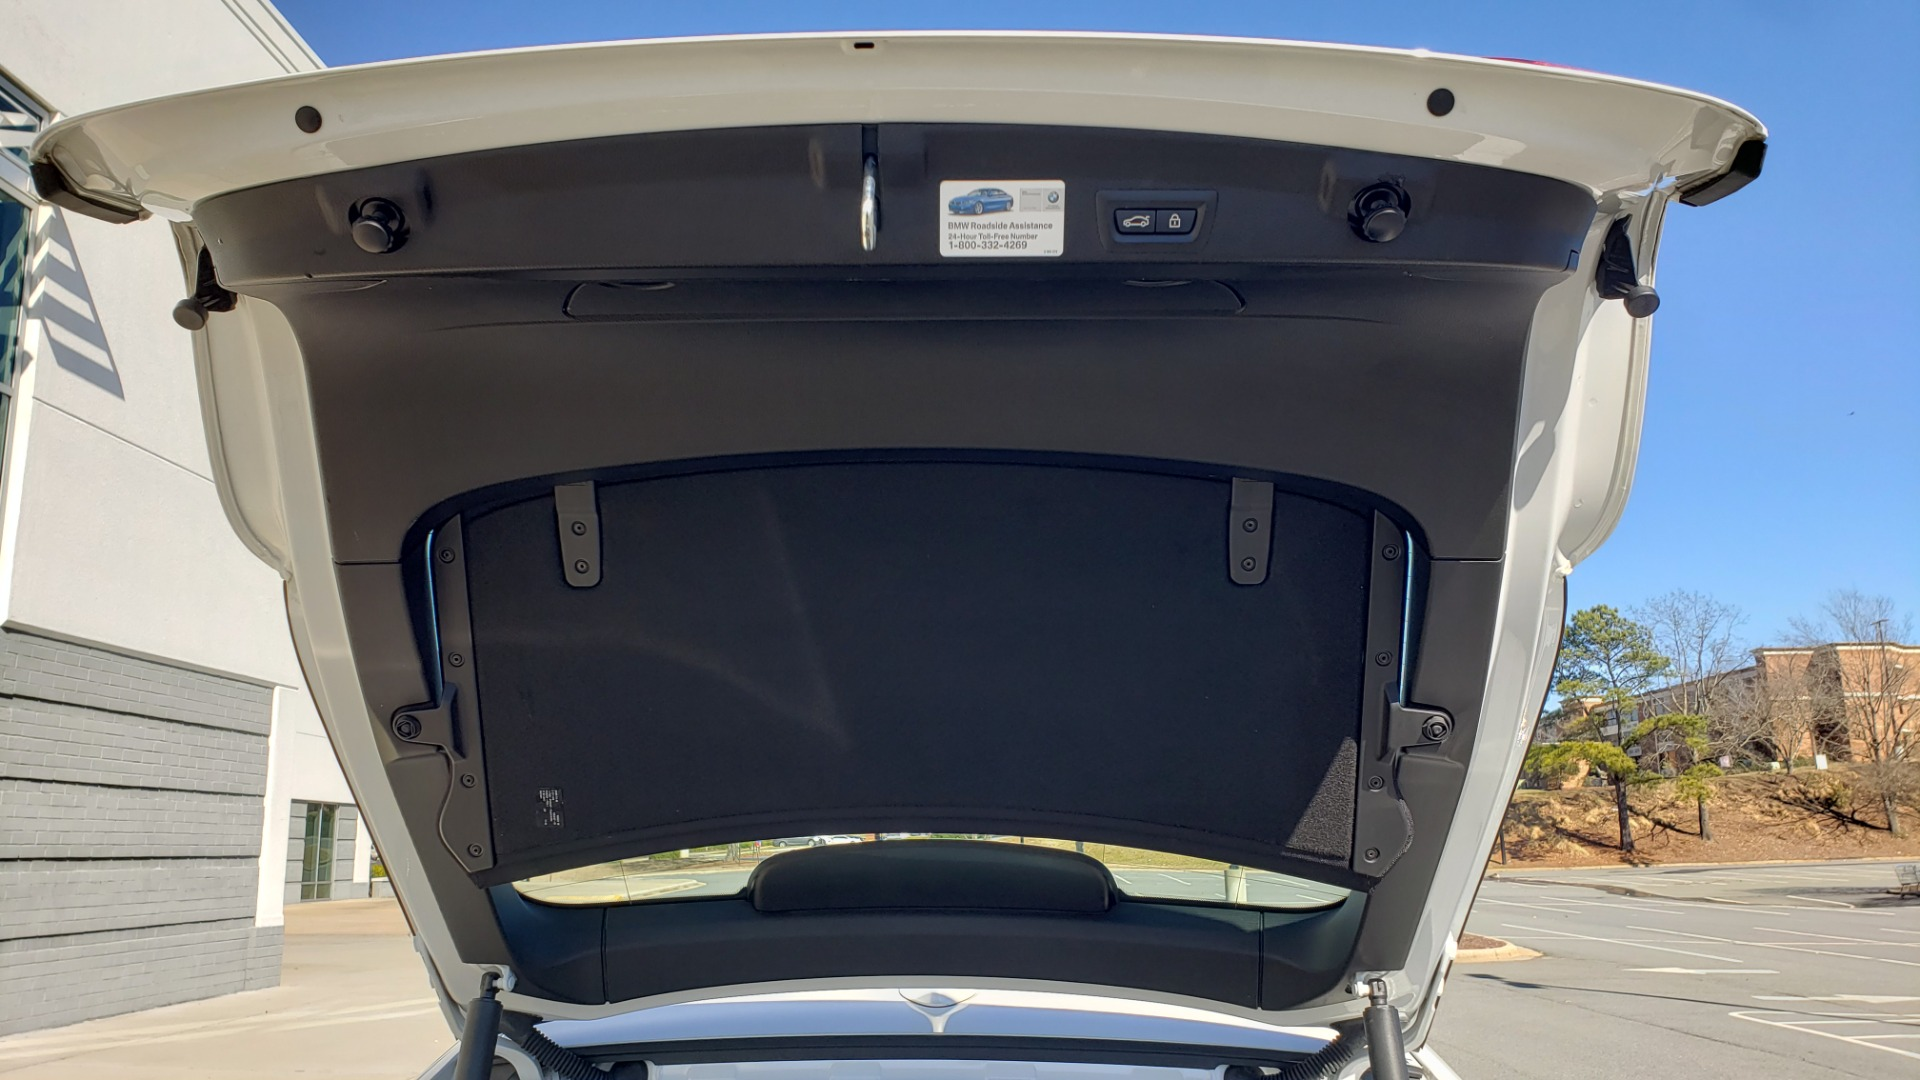 Used 2018 BMW 4 SERIES 430IXDRIVE / PREMIUM / NAV / SUNROOF / ESSENTIALS PKG for sale $27,795 at Formula Imports in Charlotte NC 28227 19